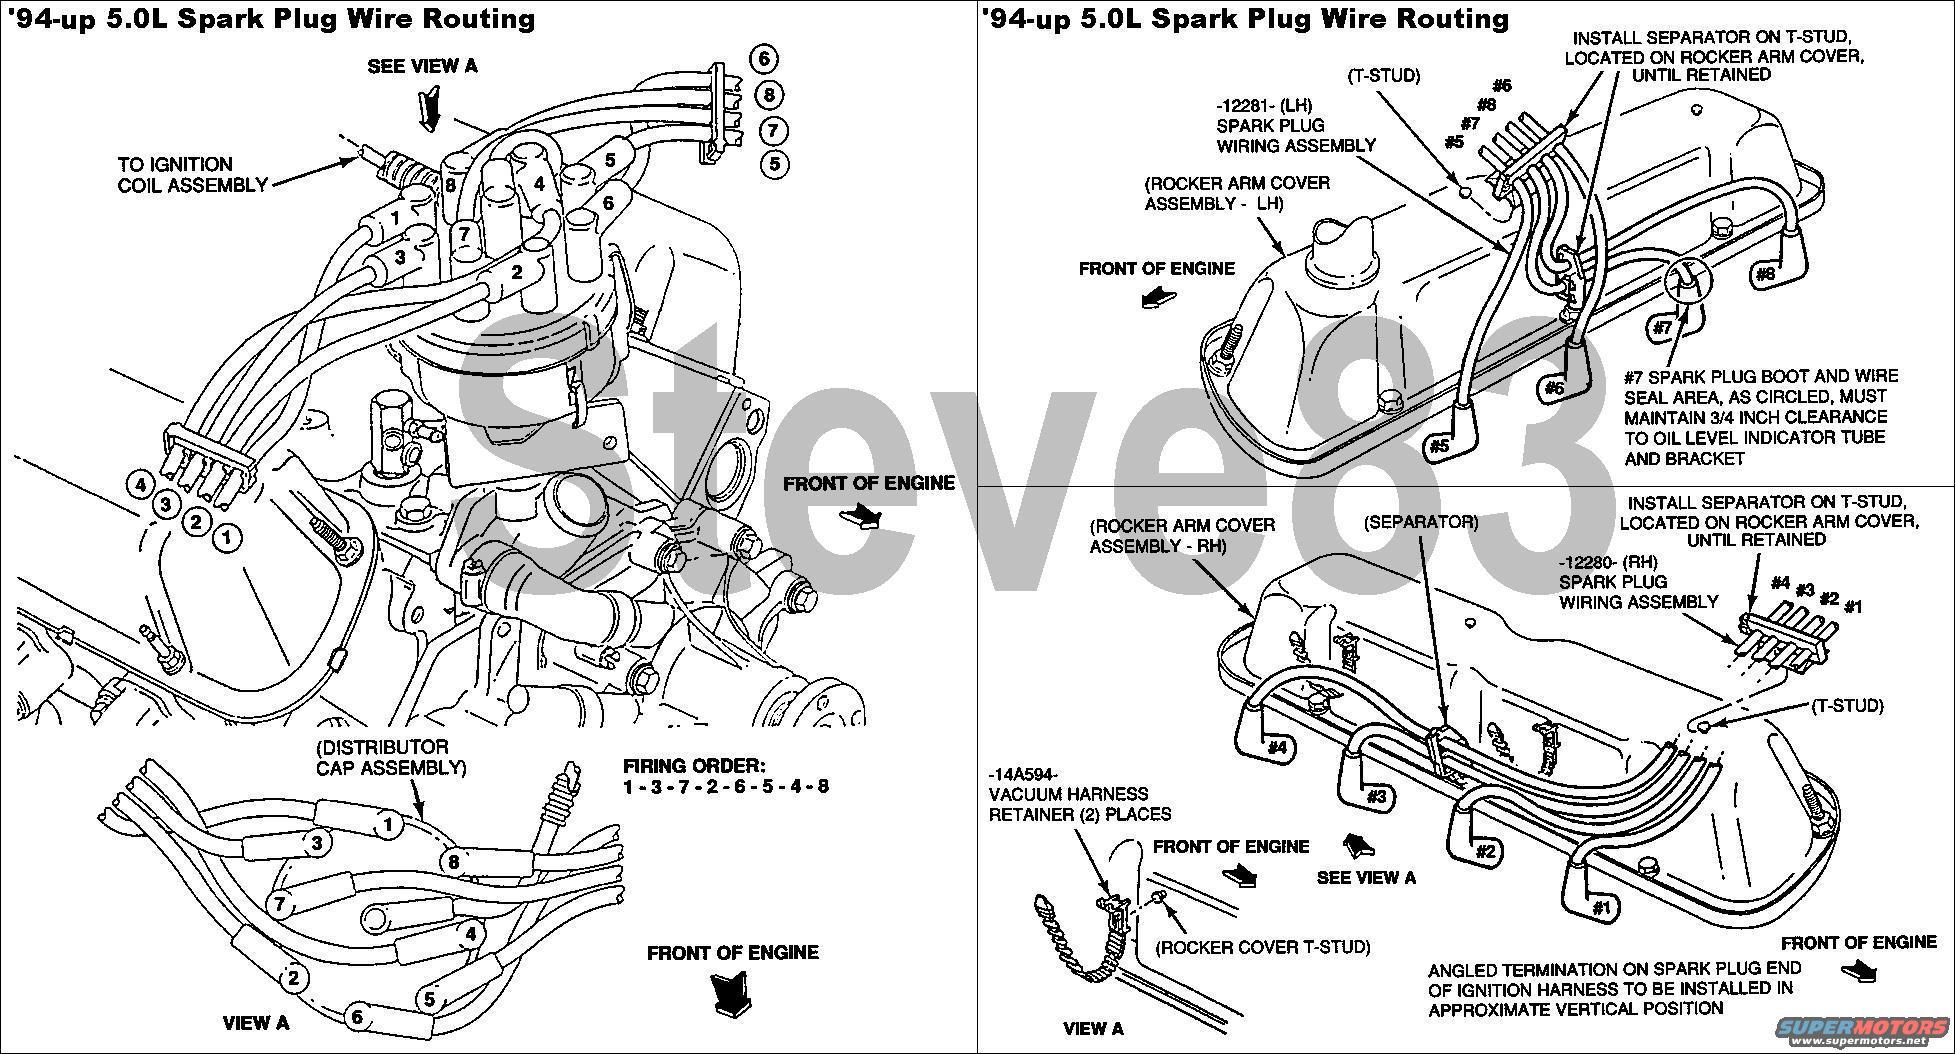 Engine sporadically sputtering/hesitating/chugging - Ford